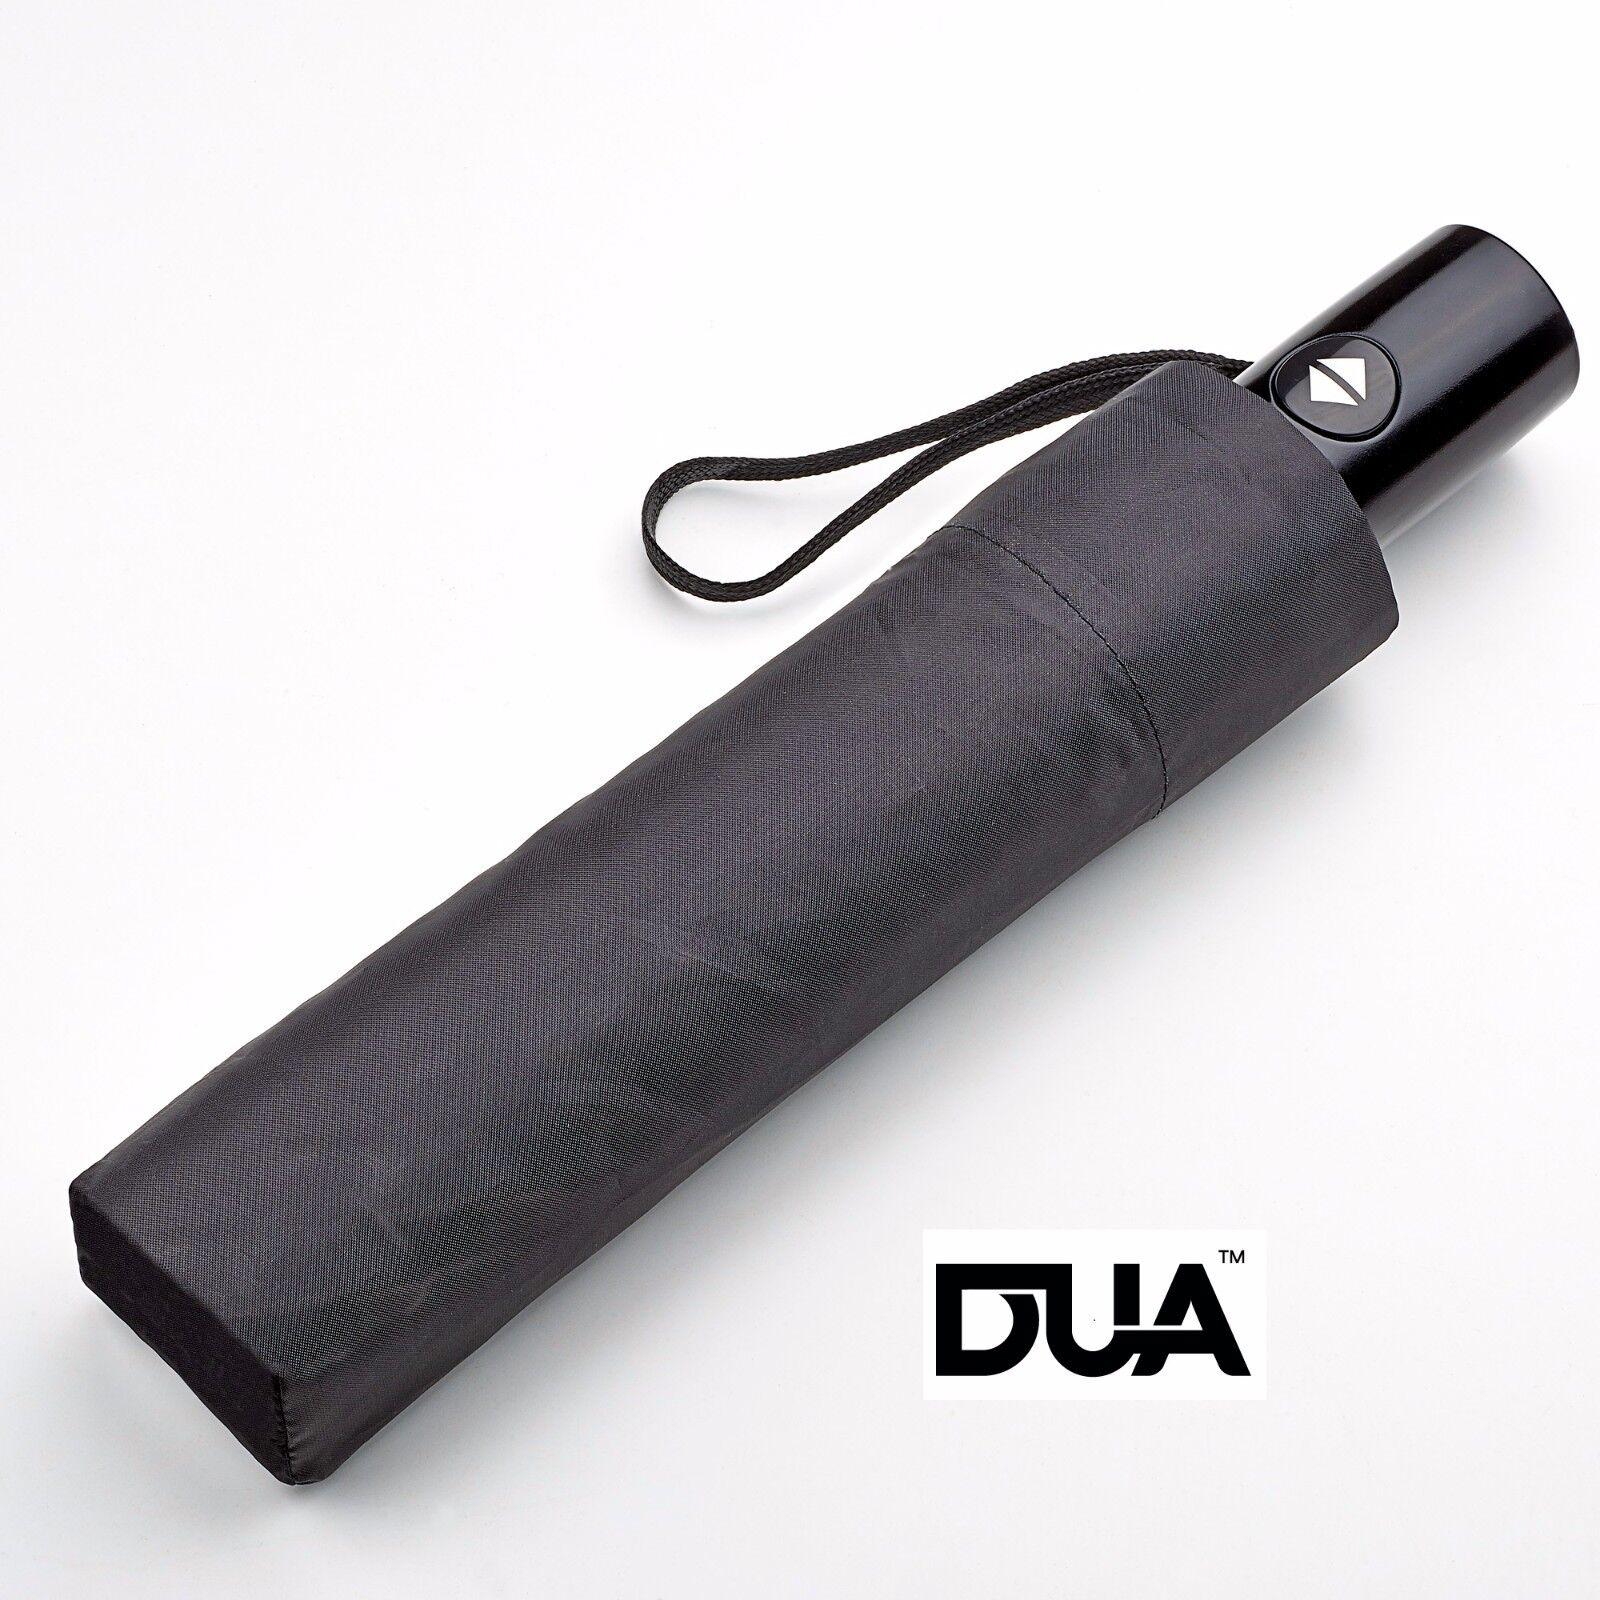 DUA Auto Open & Close Folding Umbrella - Black